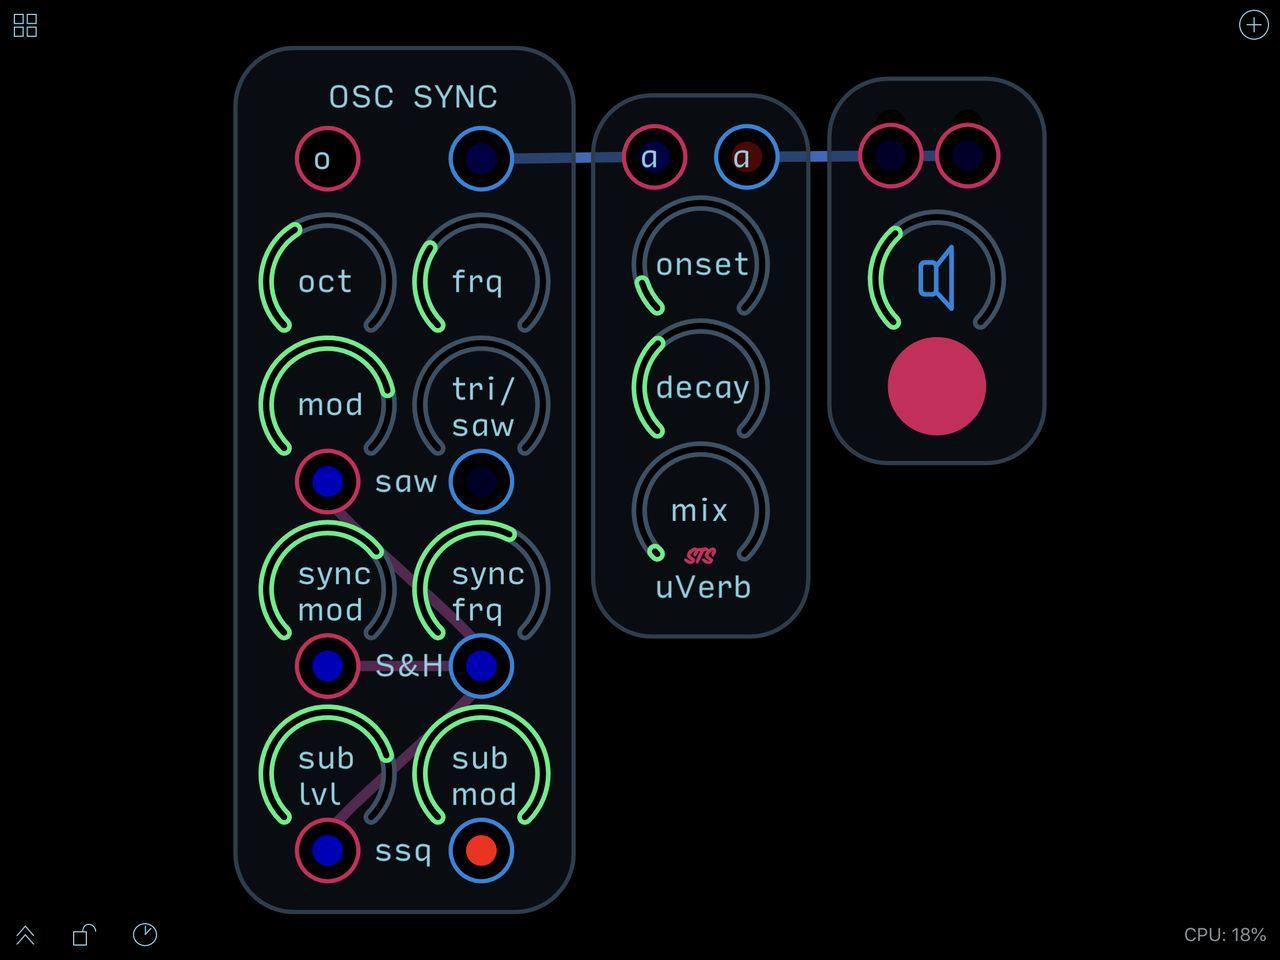 hordijk-sync-oscillator